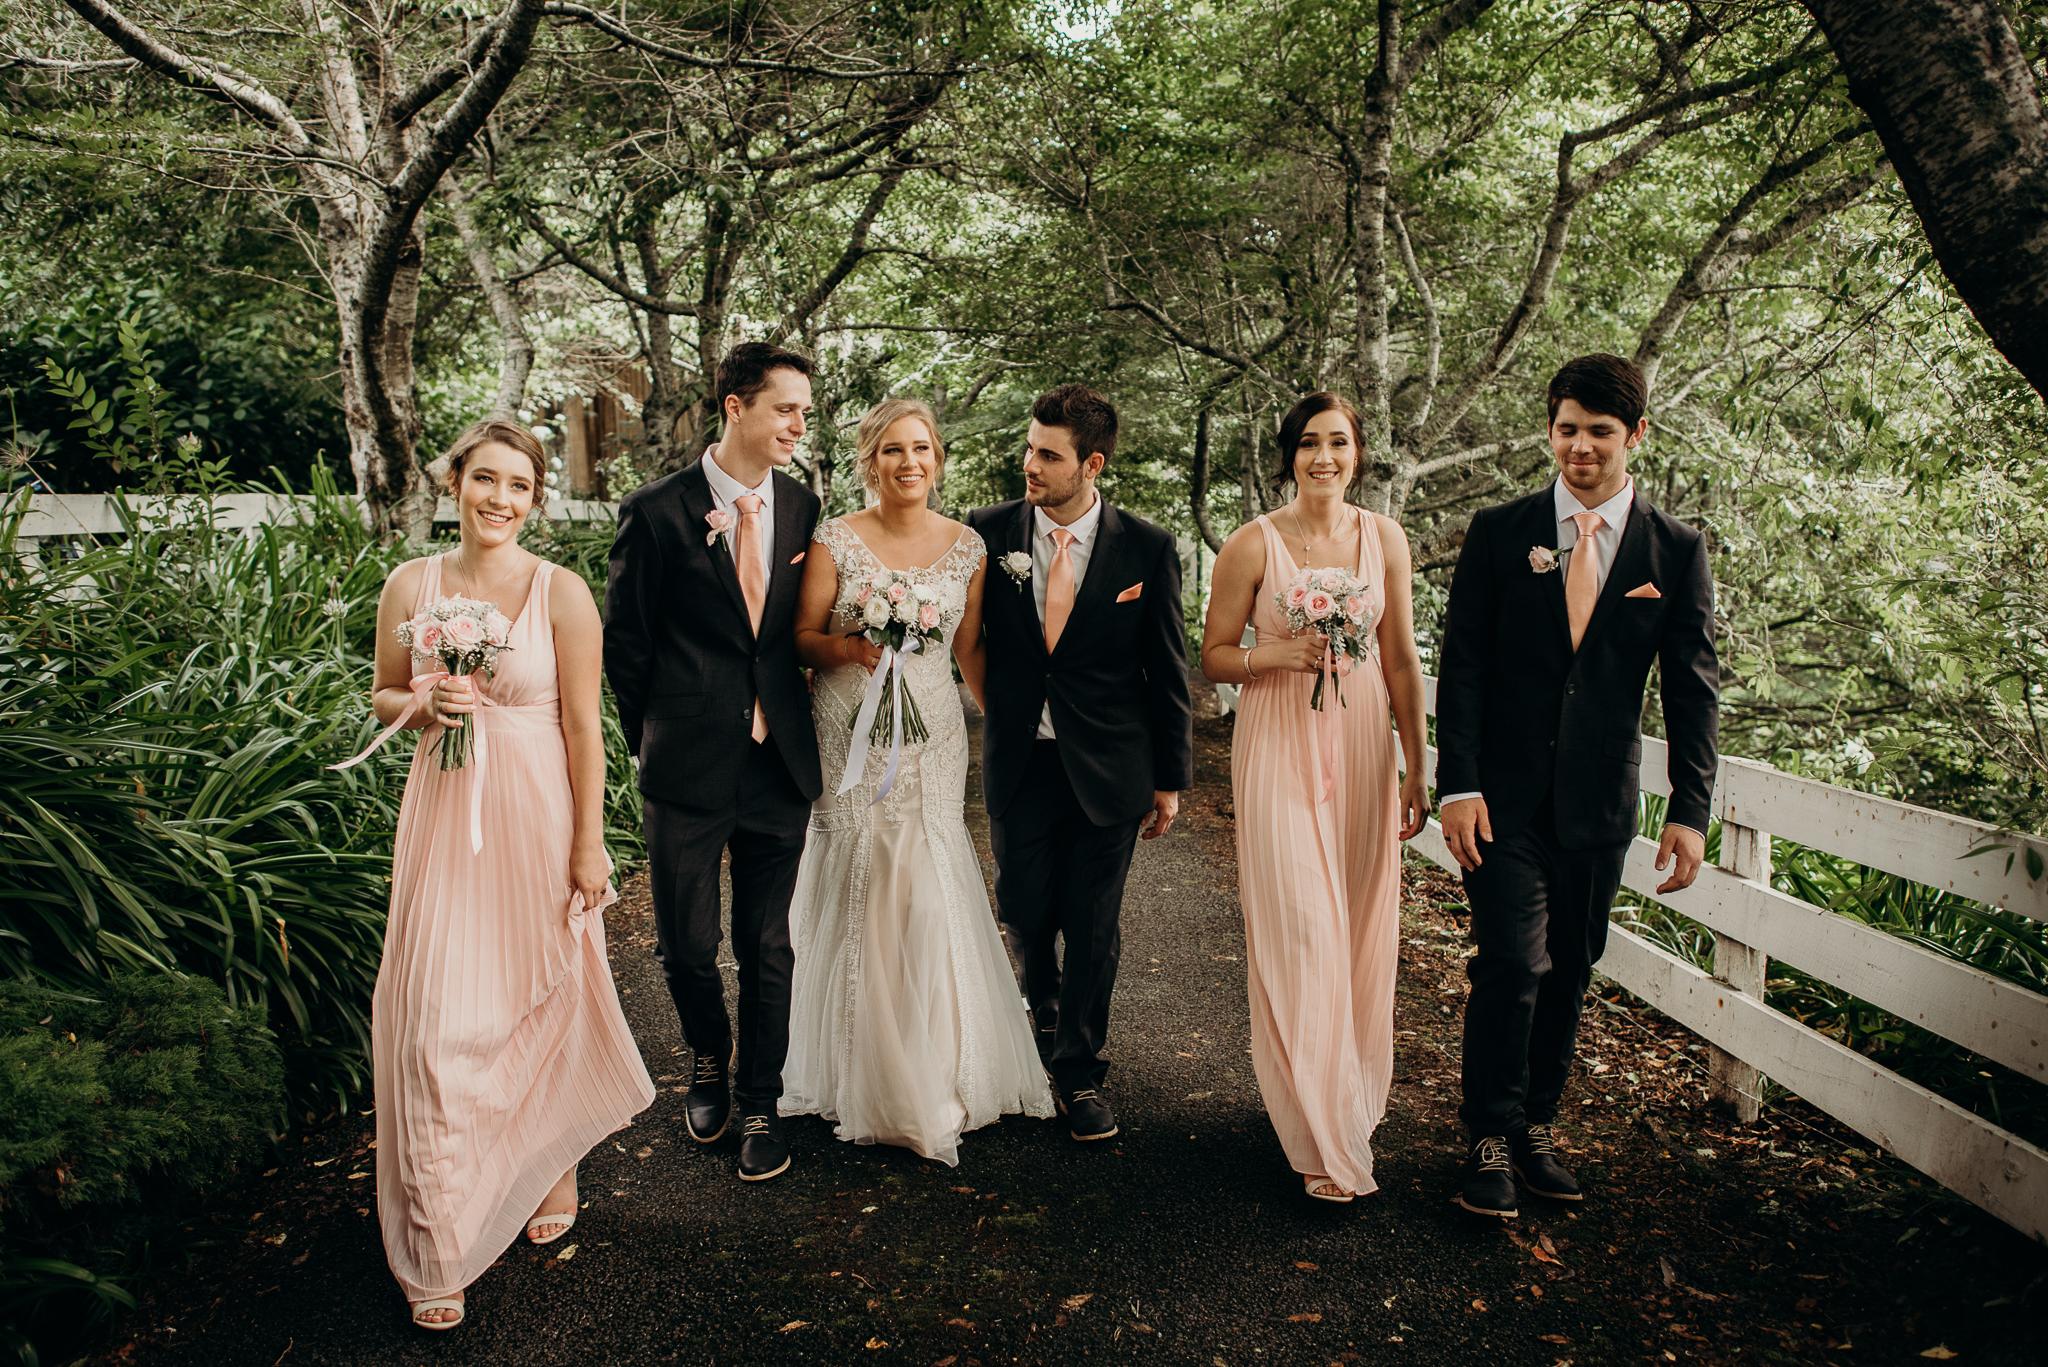 Tauranga-Coromandel-Elegant-Wedding-Photographer-Charlemagne-Lodge-76.jpg